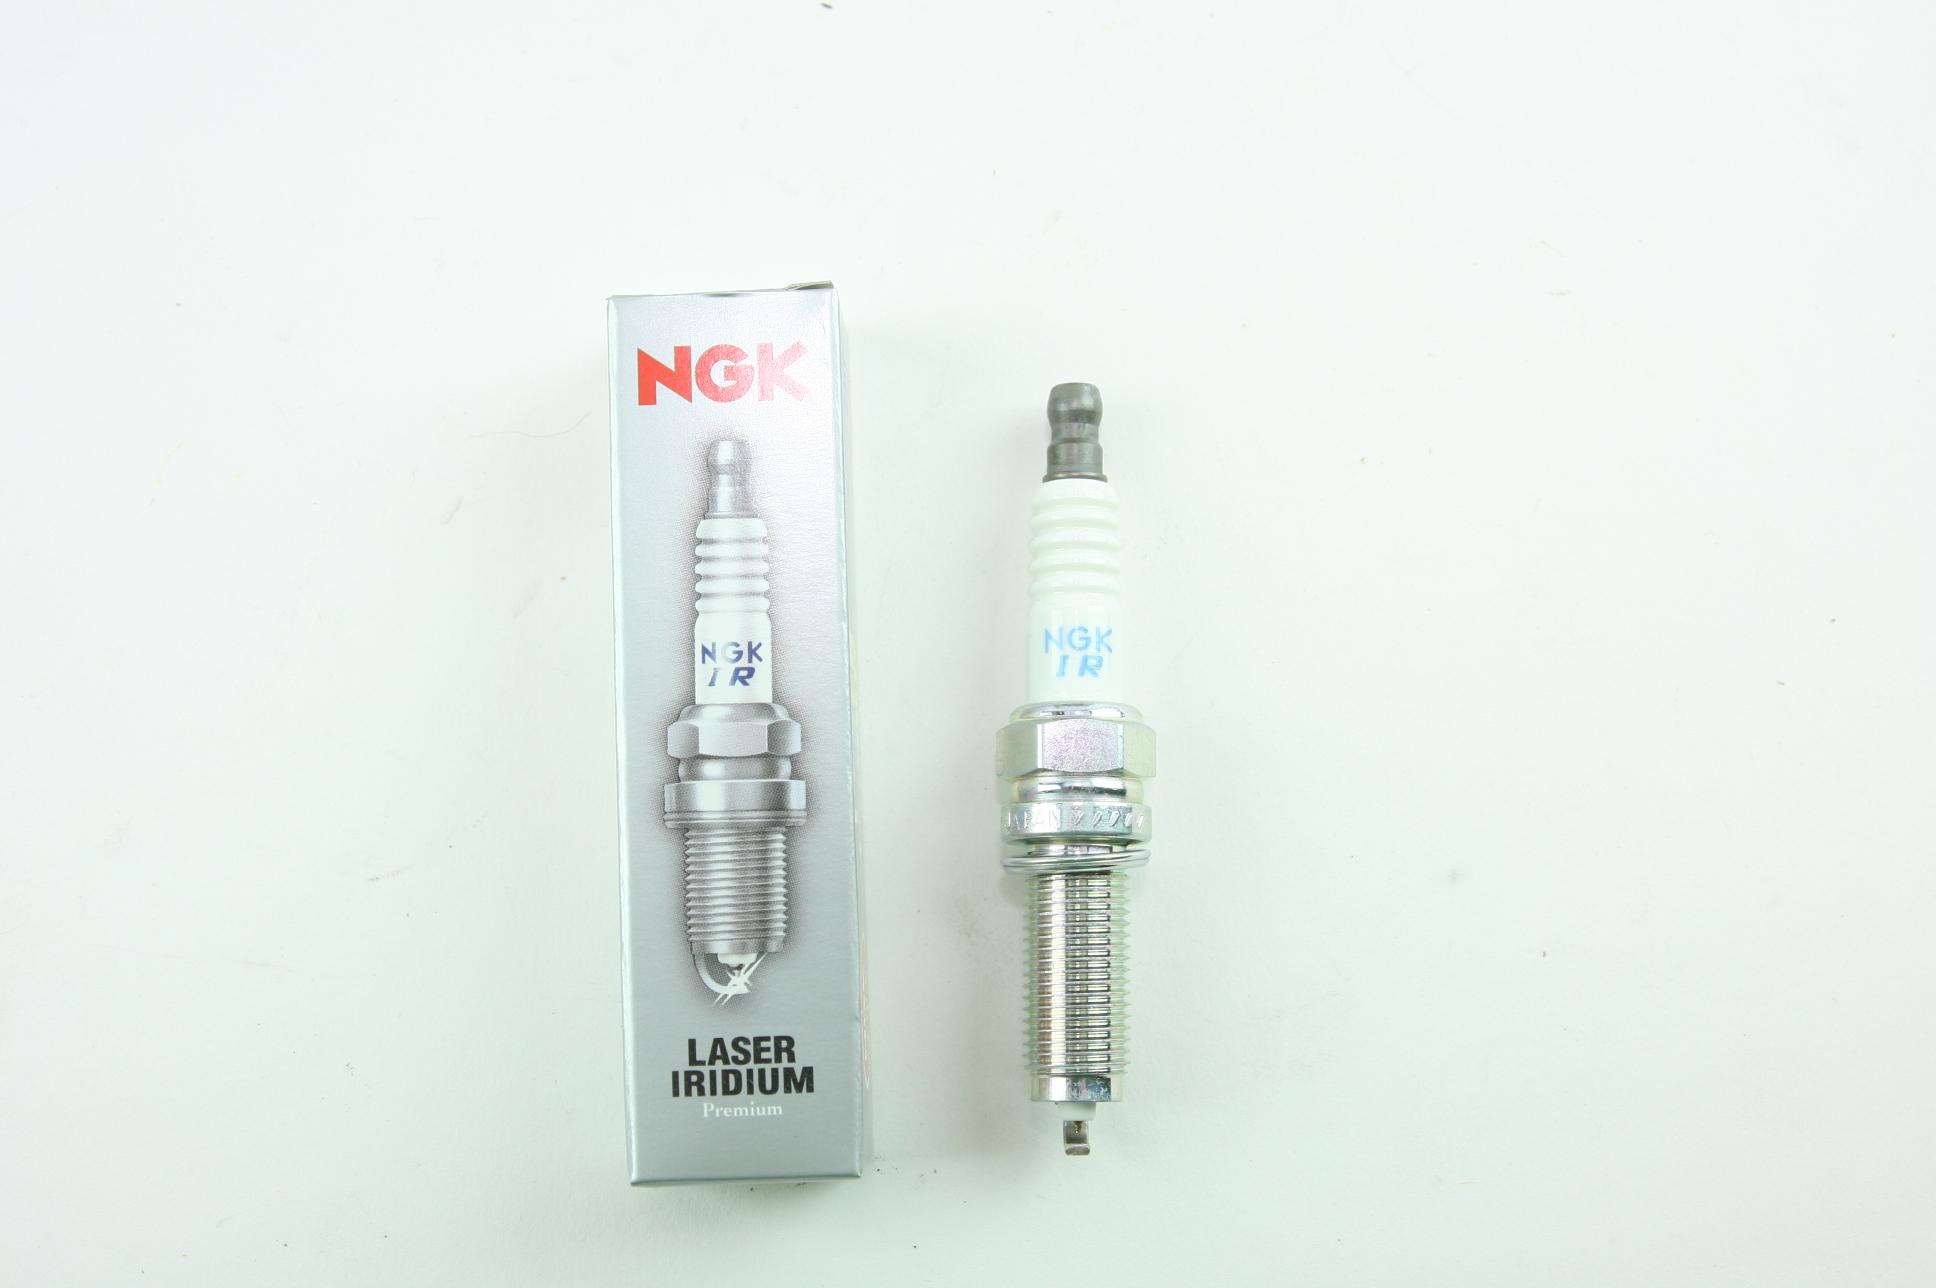 New Set of 120 (Case) NGK 7751 ILZKR7B11 Laser Iridium and Platinum Spark Plugs - image 5